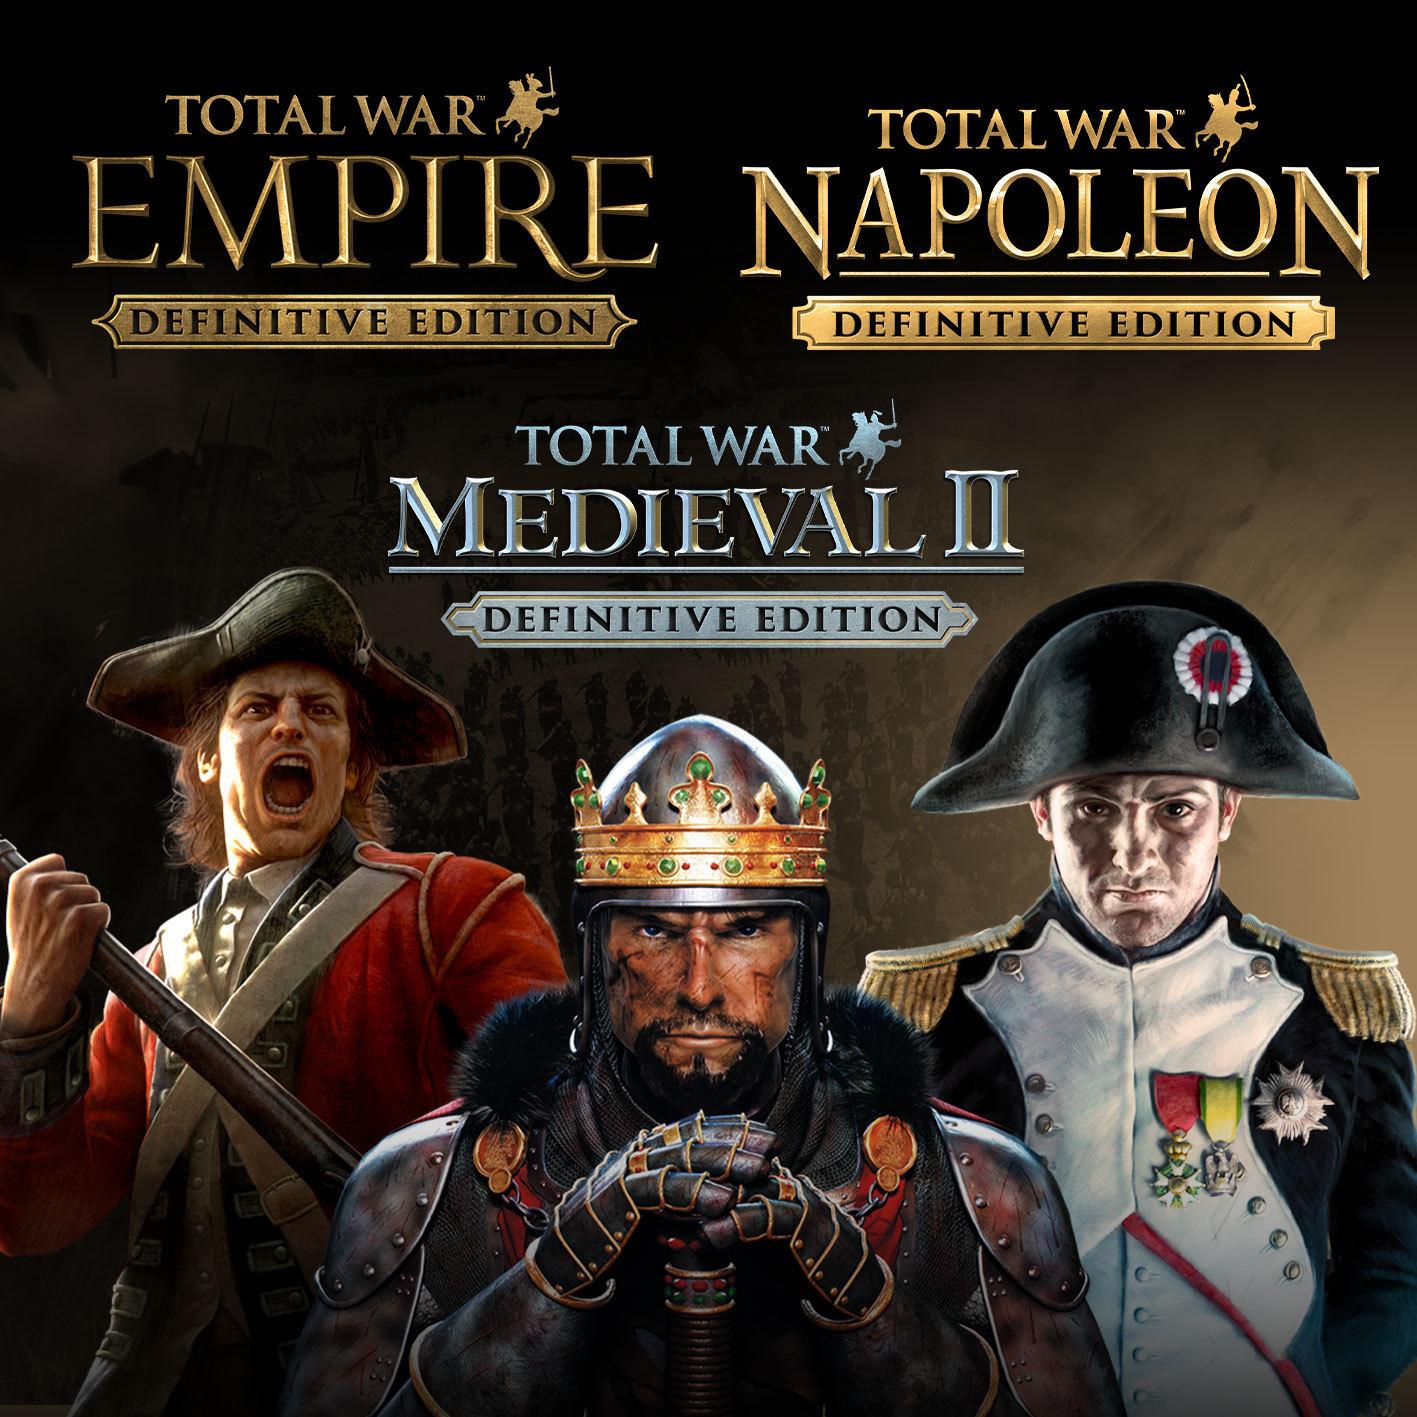 Total War: NAPOLEON - Definitive Edition